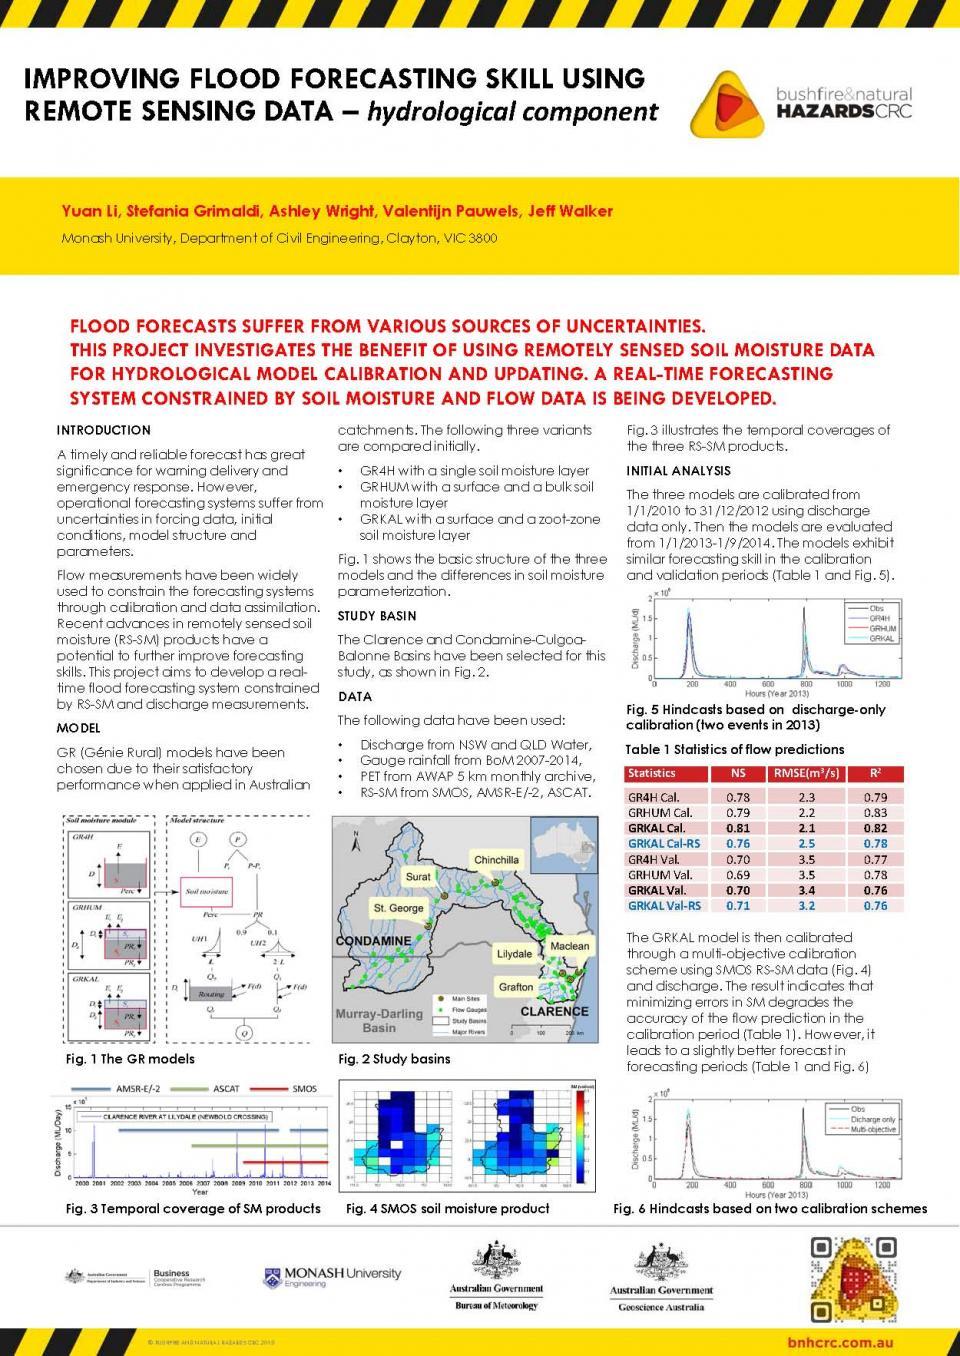 Improving Flood Forecasting Skill Using Remote Sensing Data - Hydrological Component